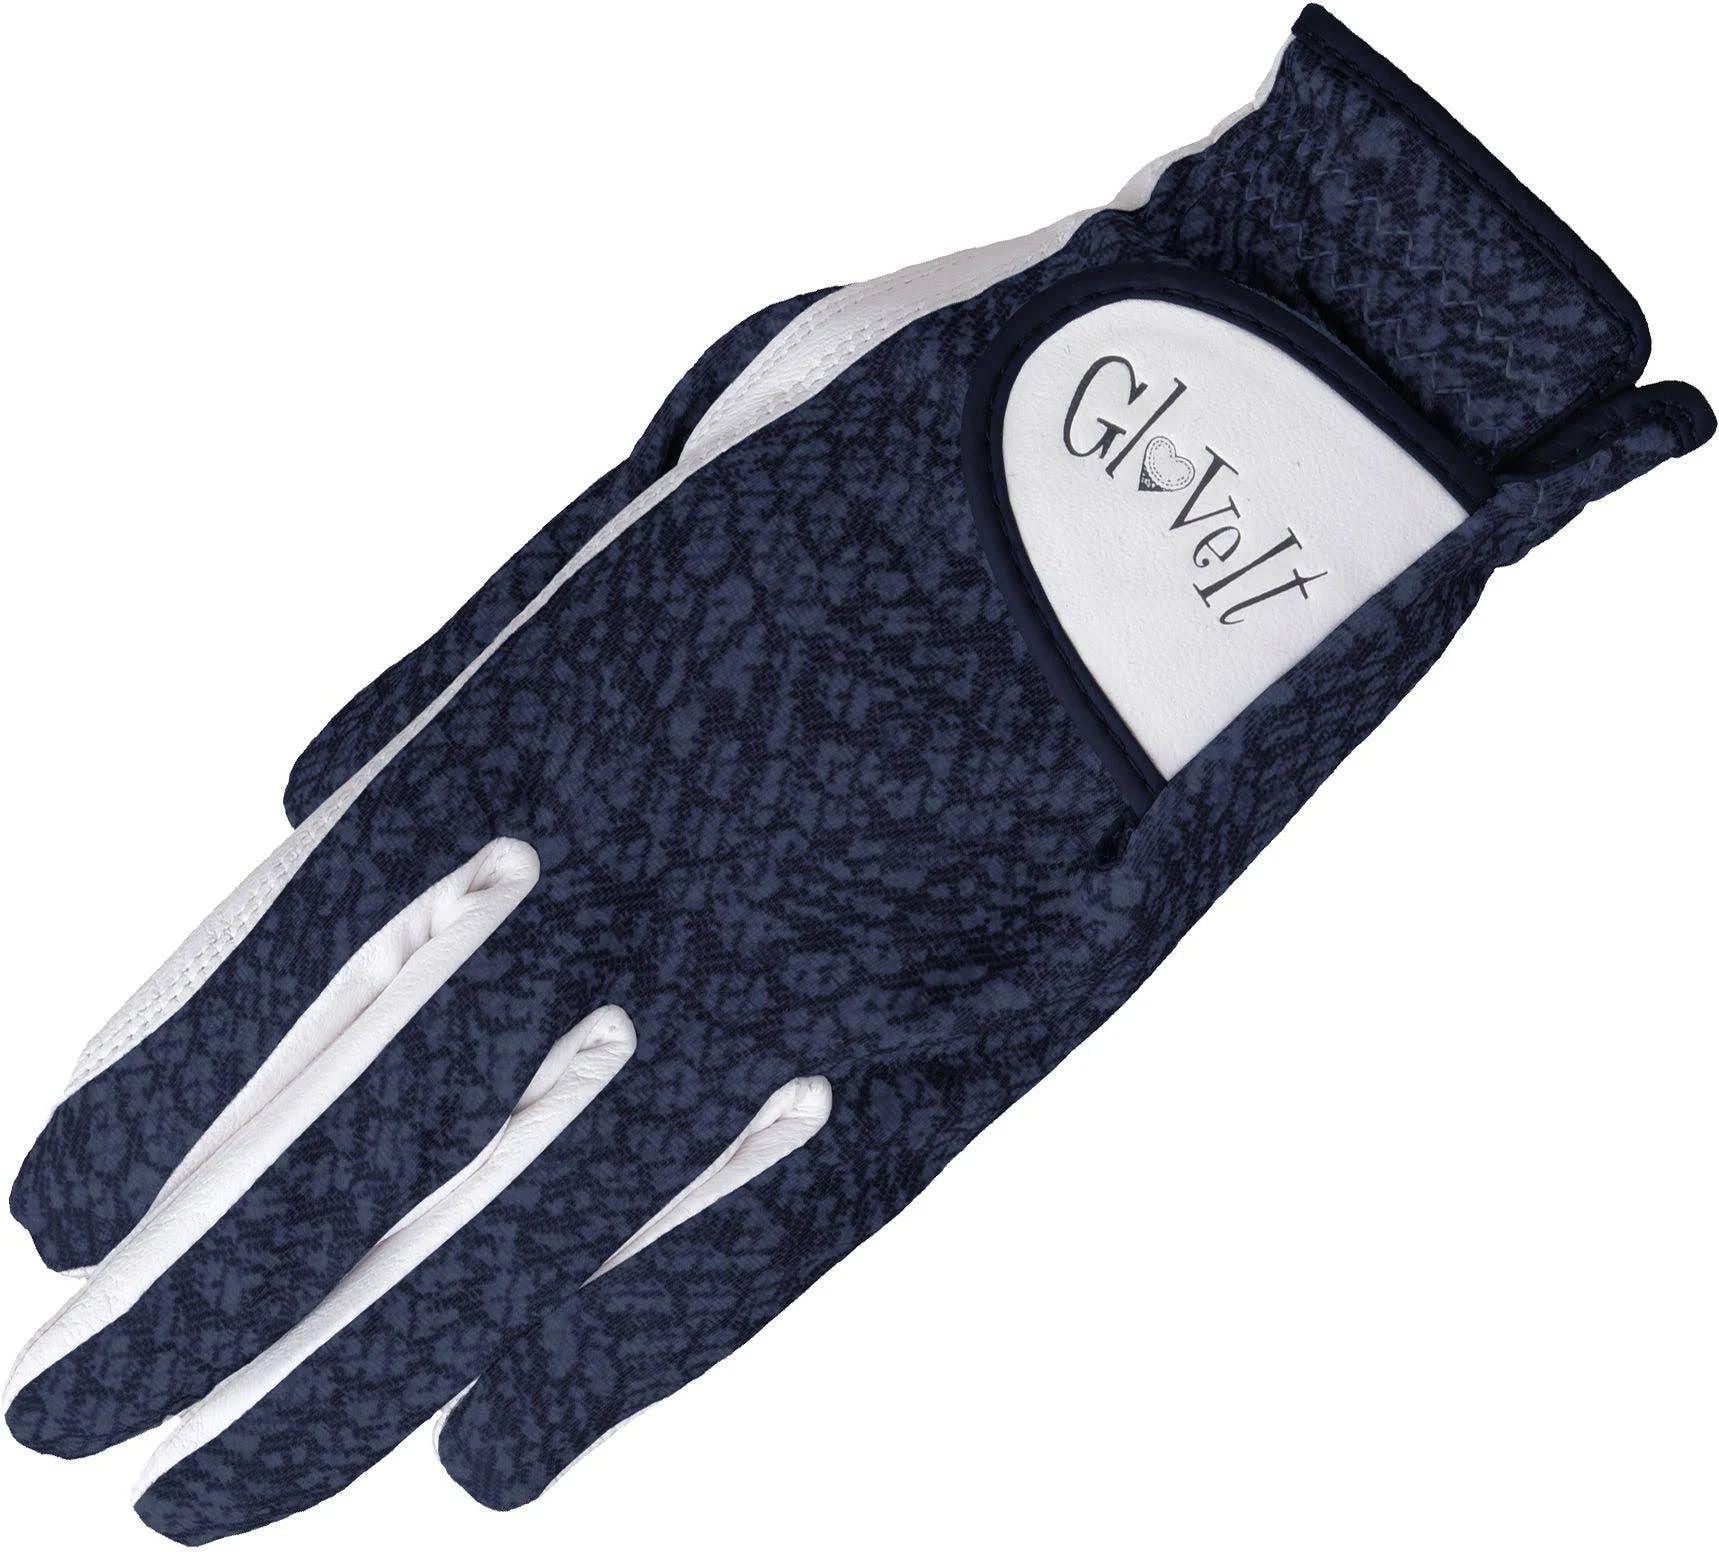 Glove It Chic Slate Golf Glove